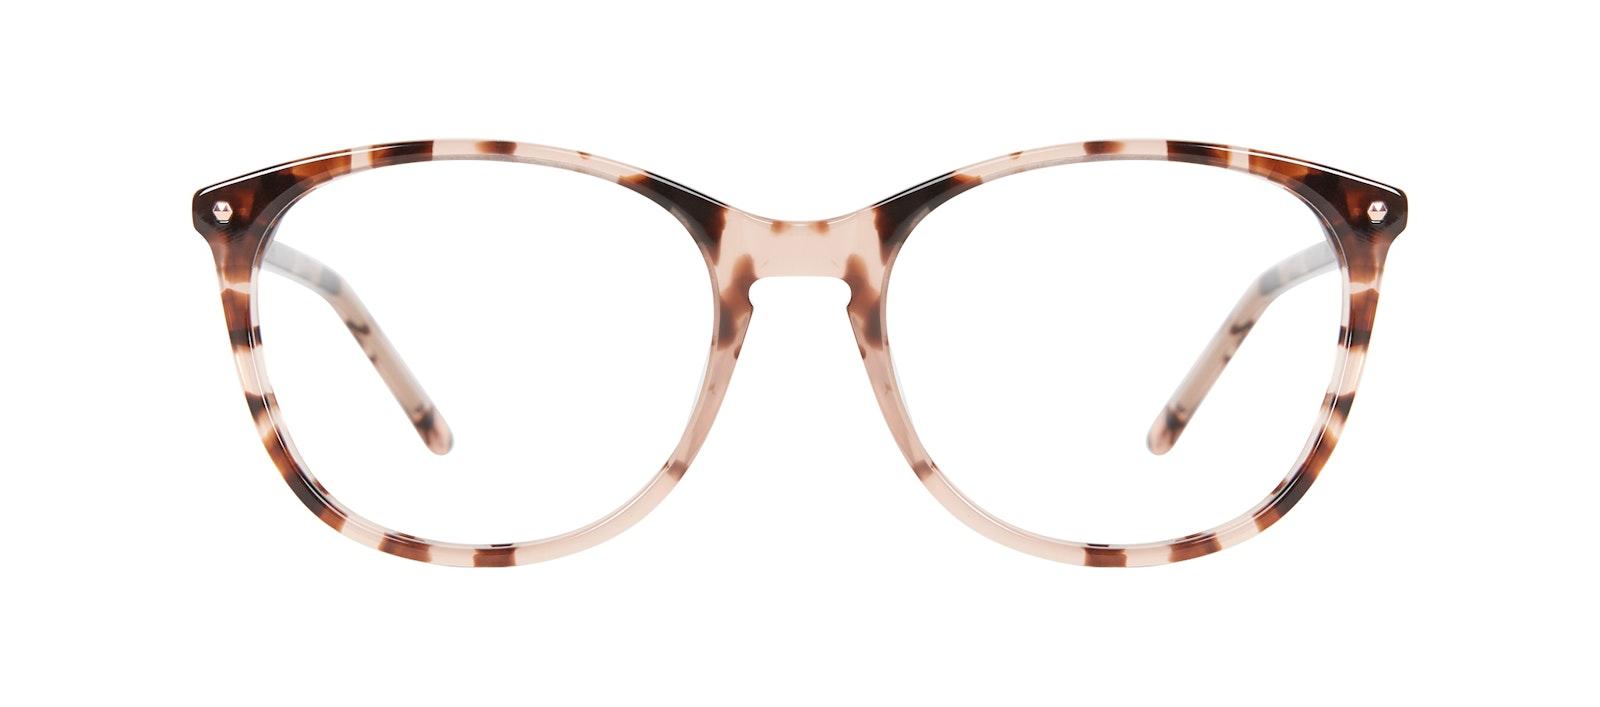 Affordable Fashion Glasses Rectangle Square Round Eyeglasses Women Nadine Pink Tortoise Front